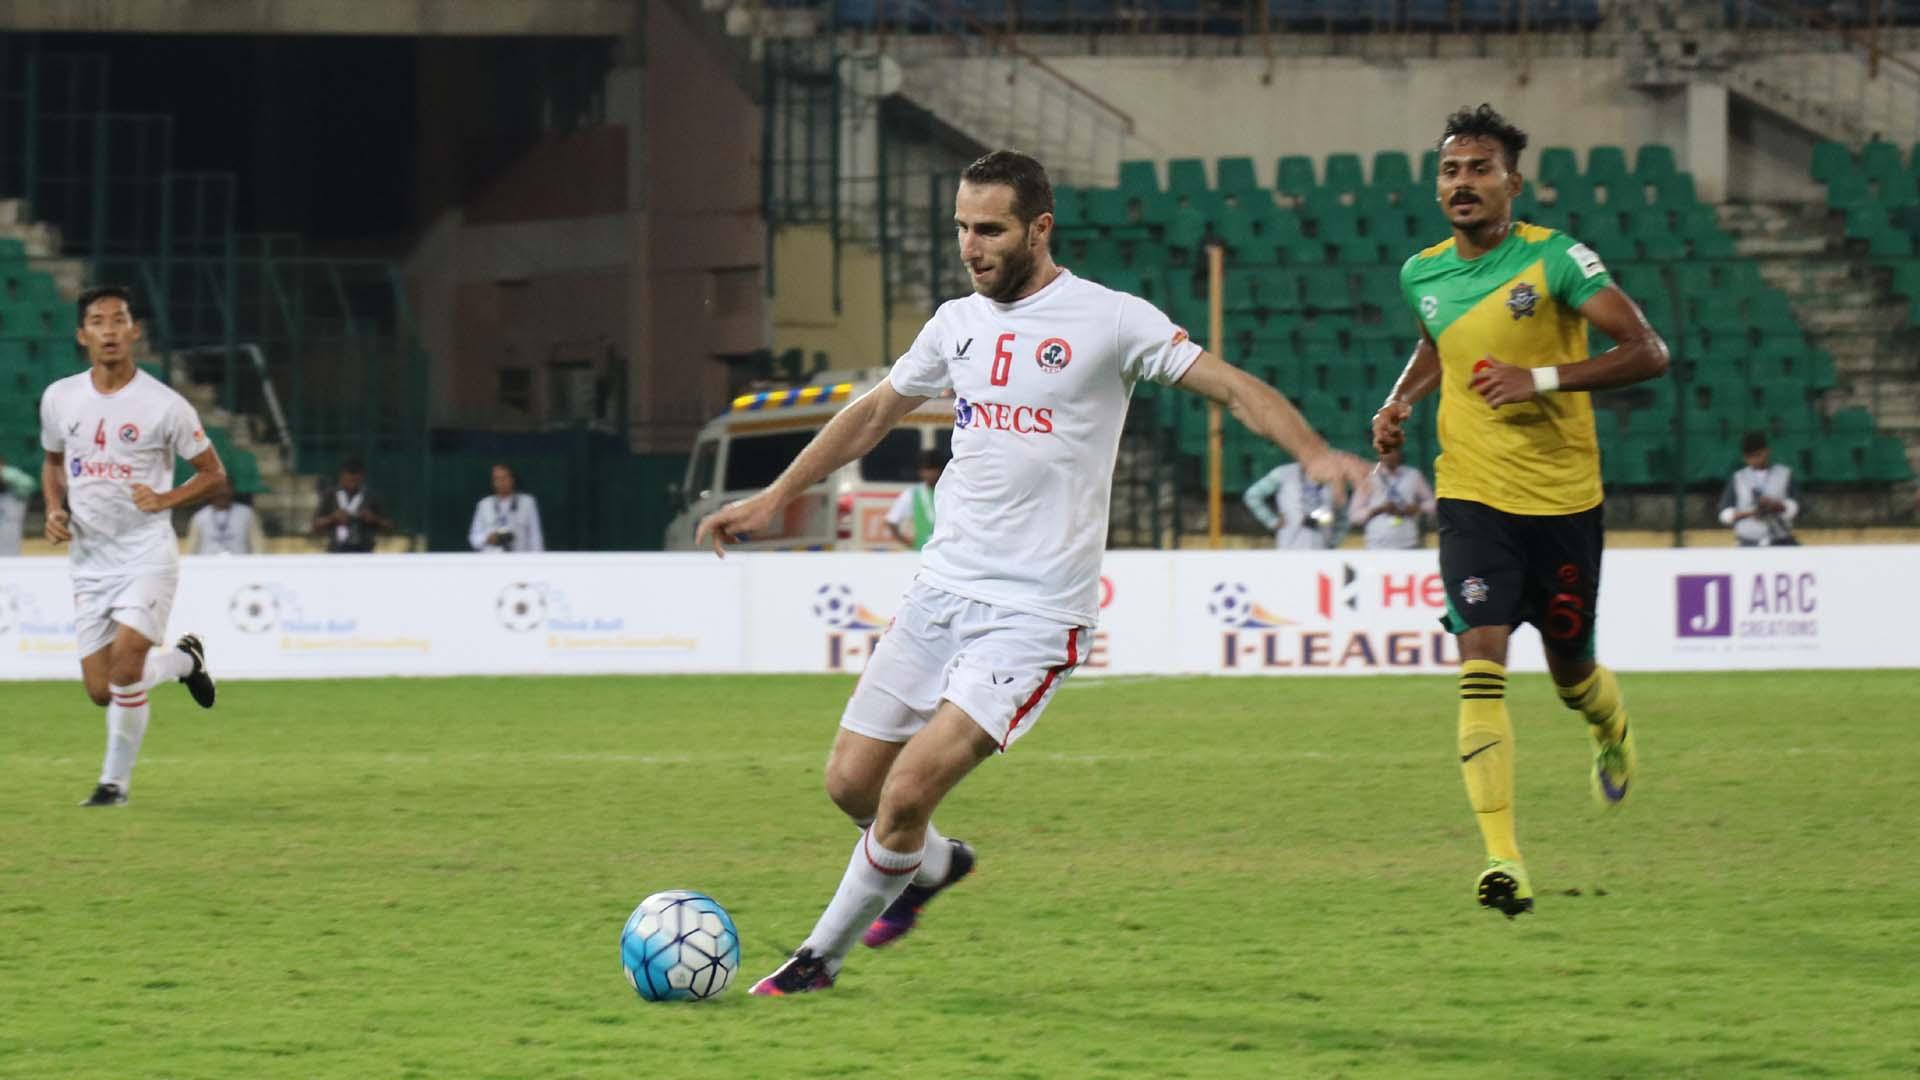 mahmoud al amenah chennai city fc aizawl fc i league 2017 ghaew3zn8pve1ctimqnnp327b - 5 Talking Points Of Shillong Lajong VS East Bengal FC Match